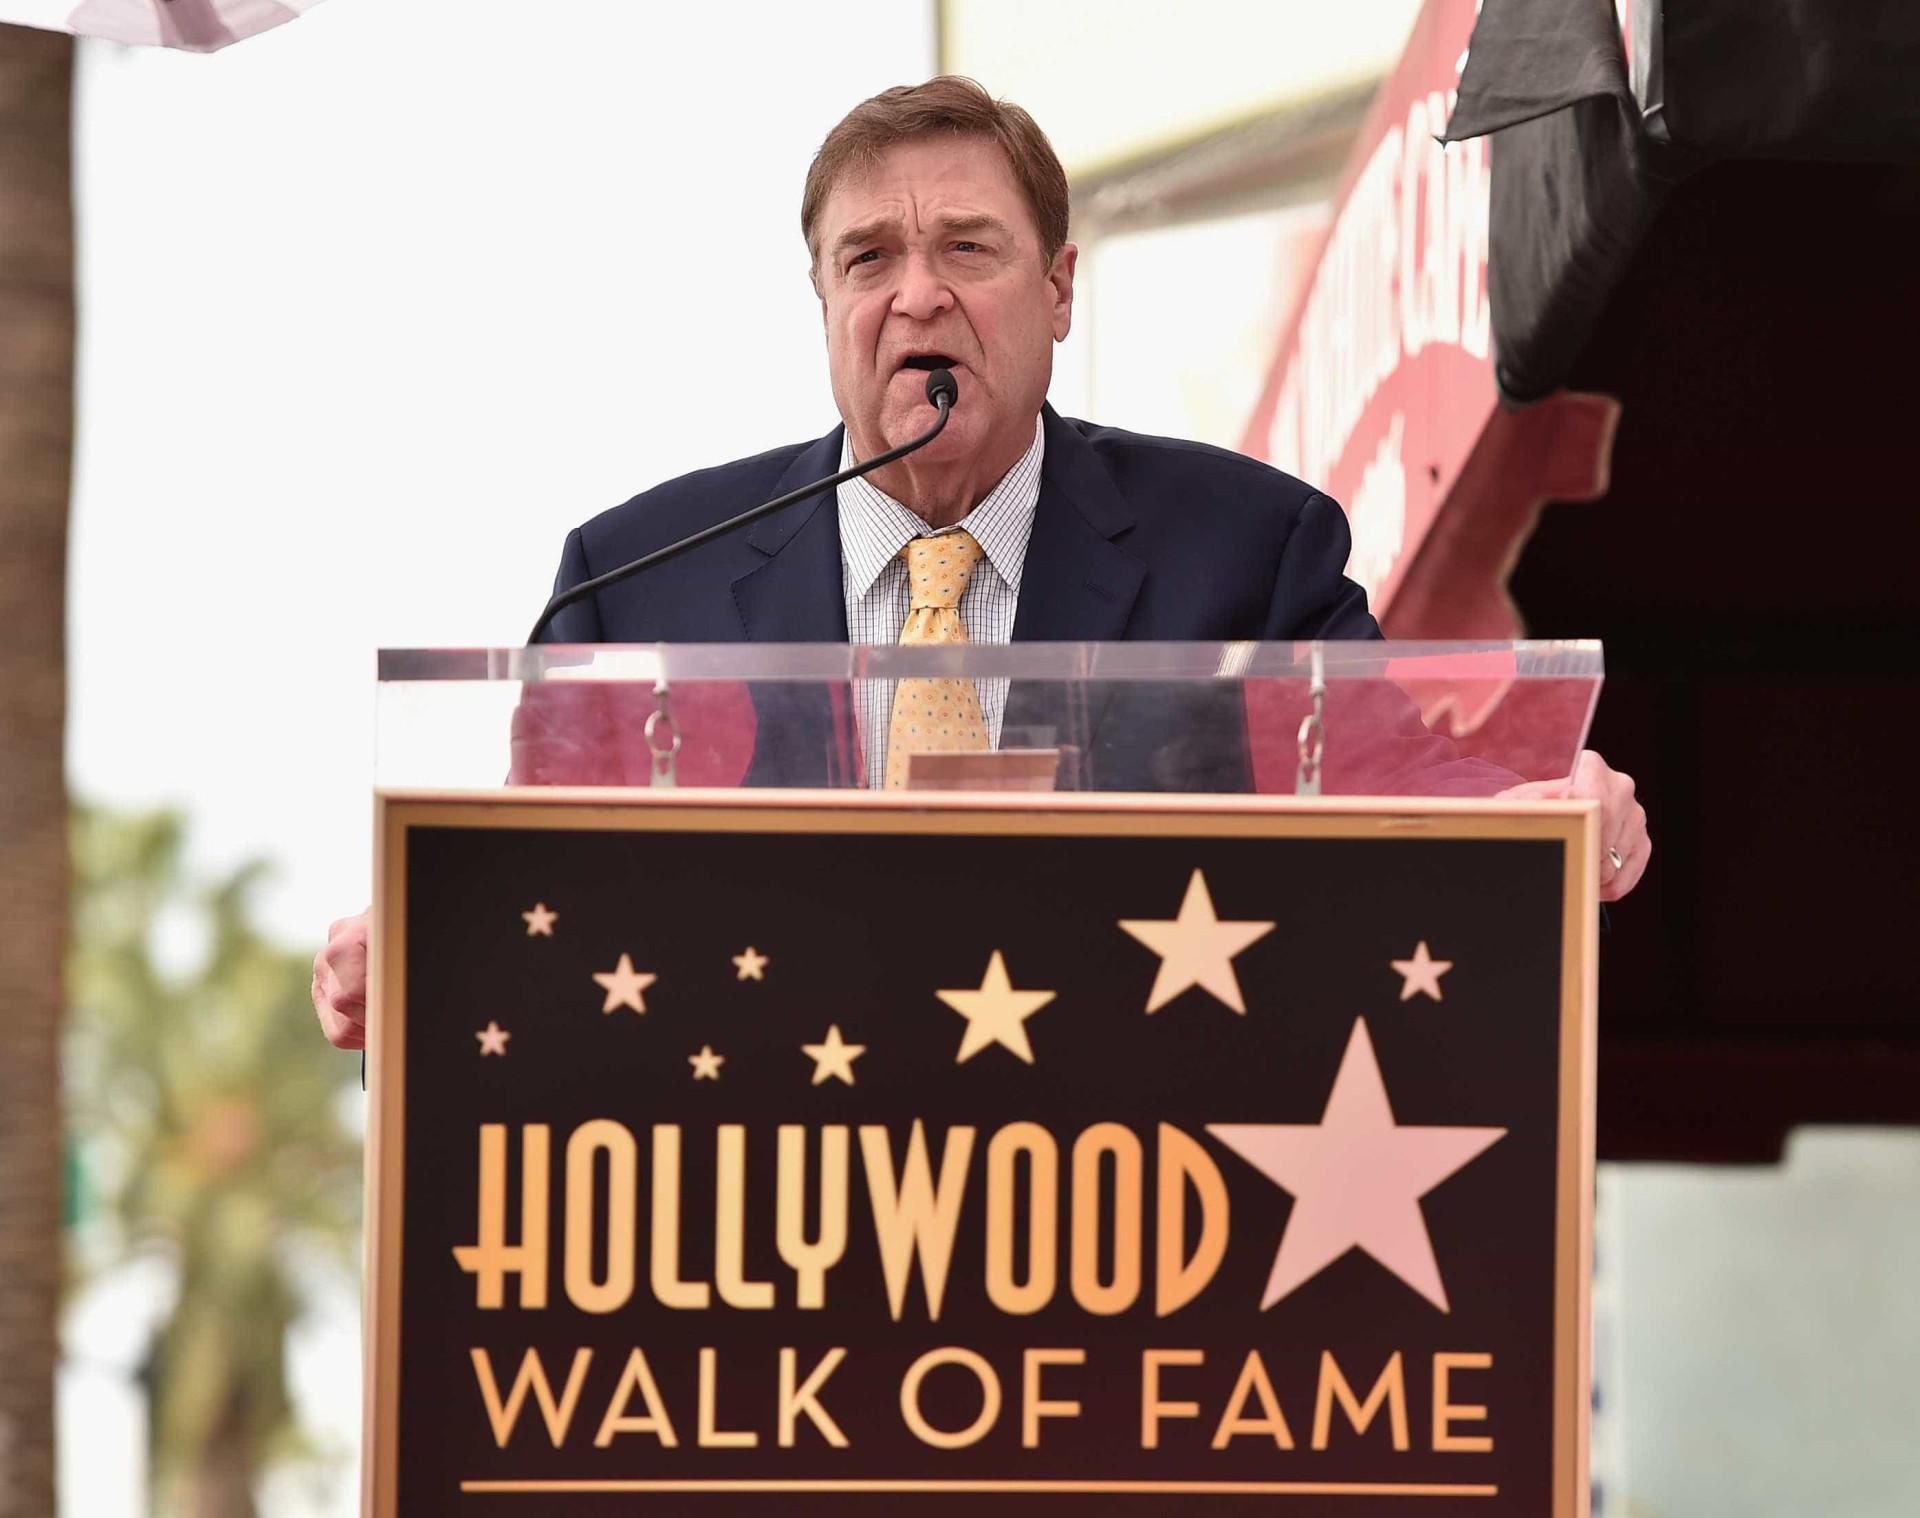 John Goodman recebe estrela na Calçada da Fama de Hollywood